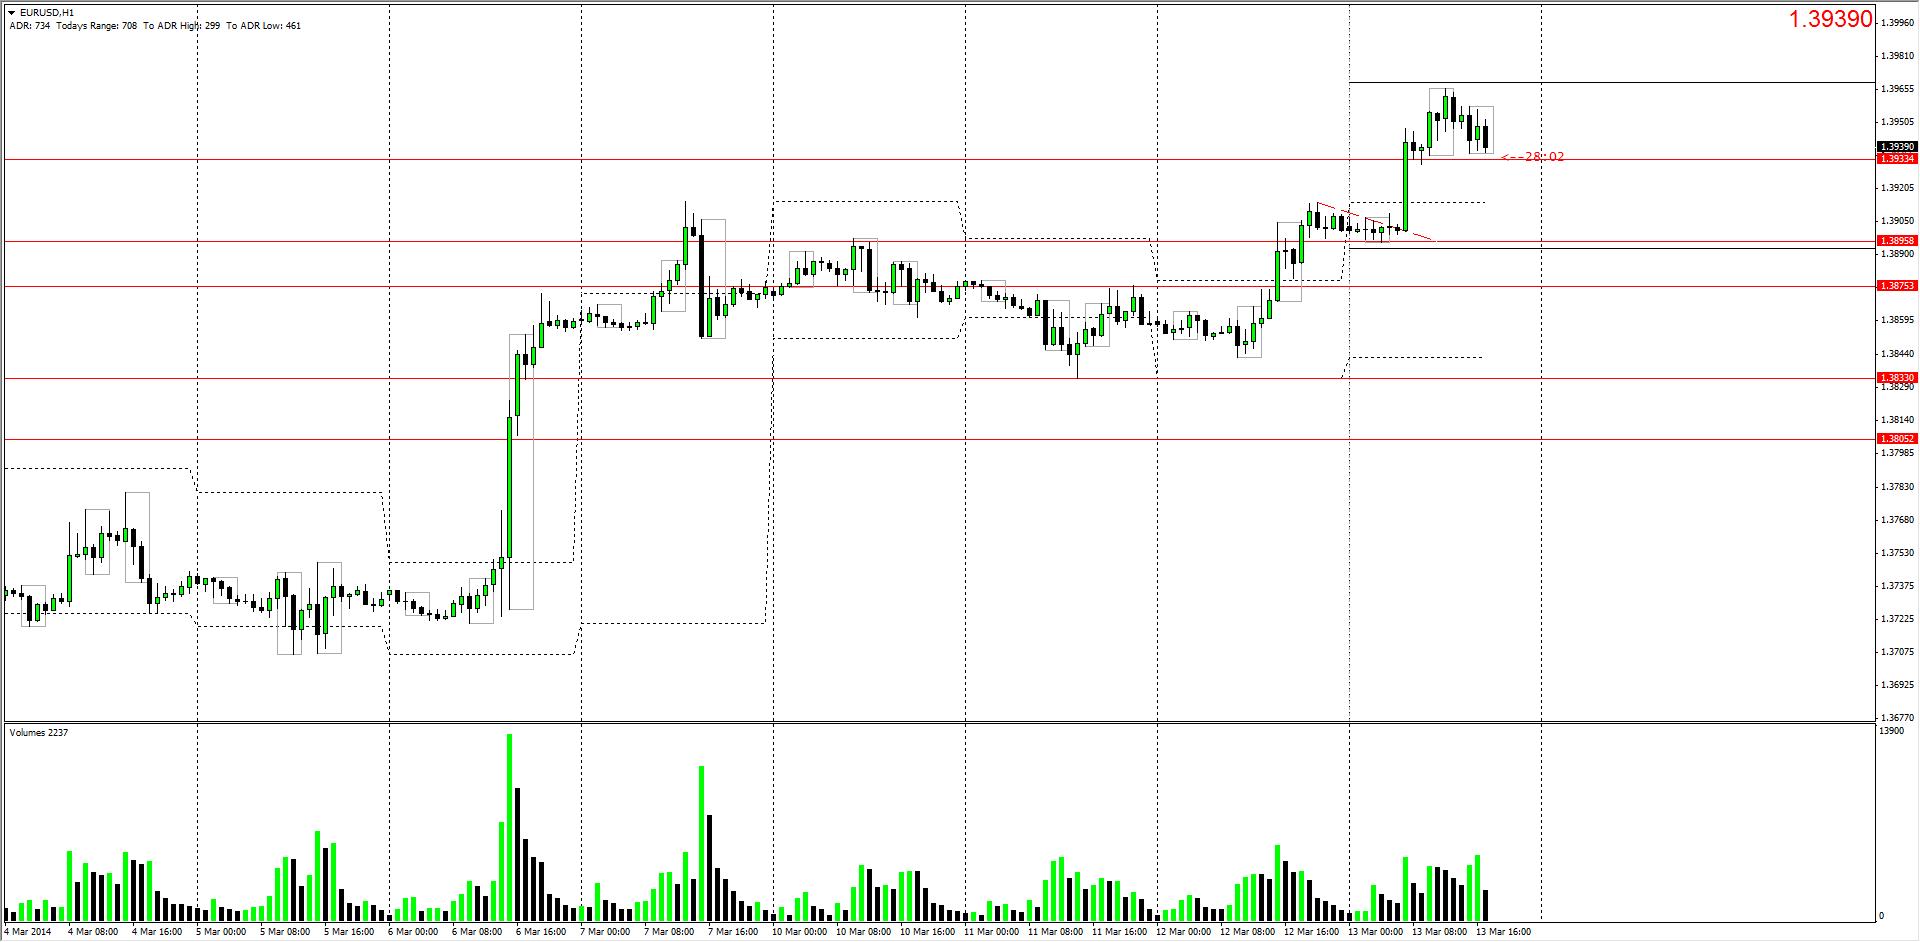 EURUSD H1 CHART MARCH 13, 2014